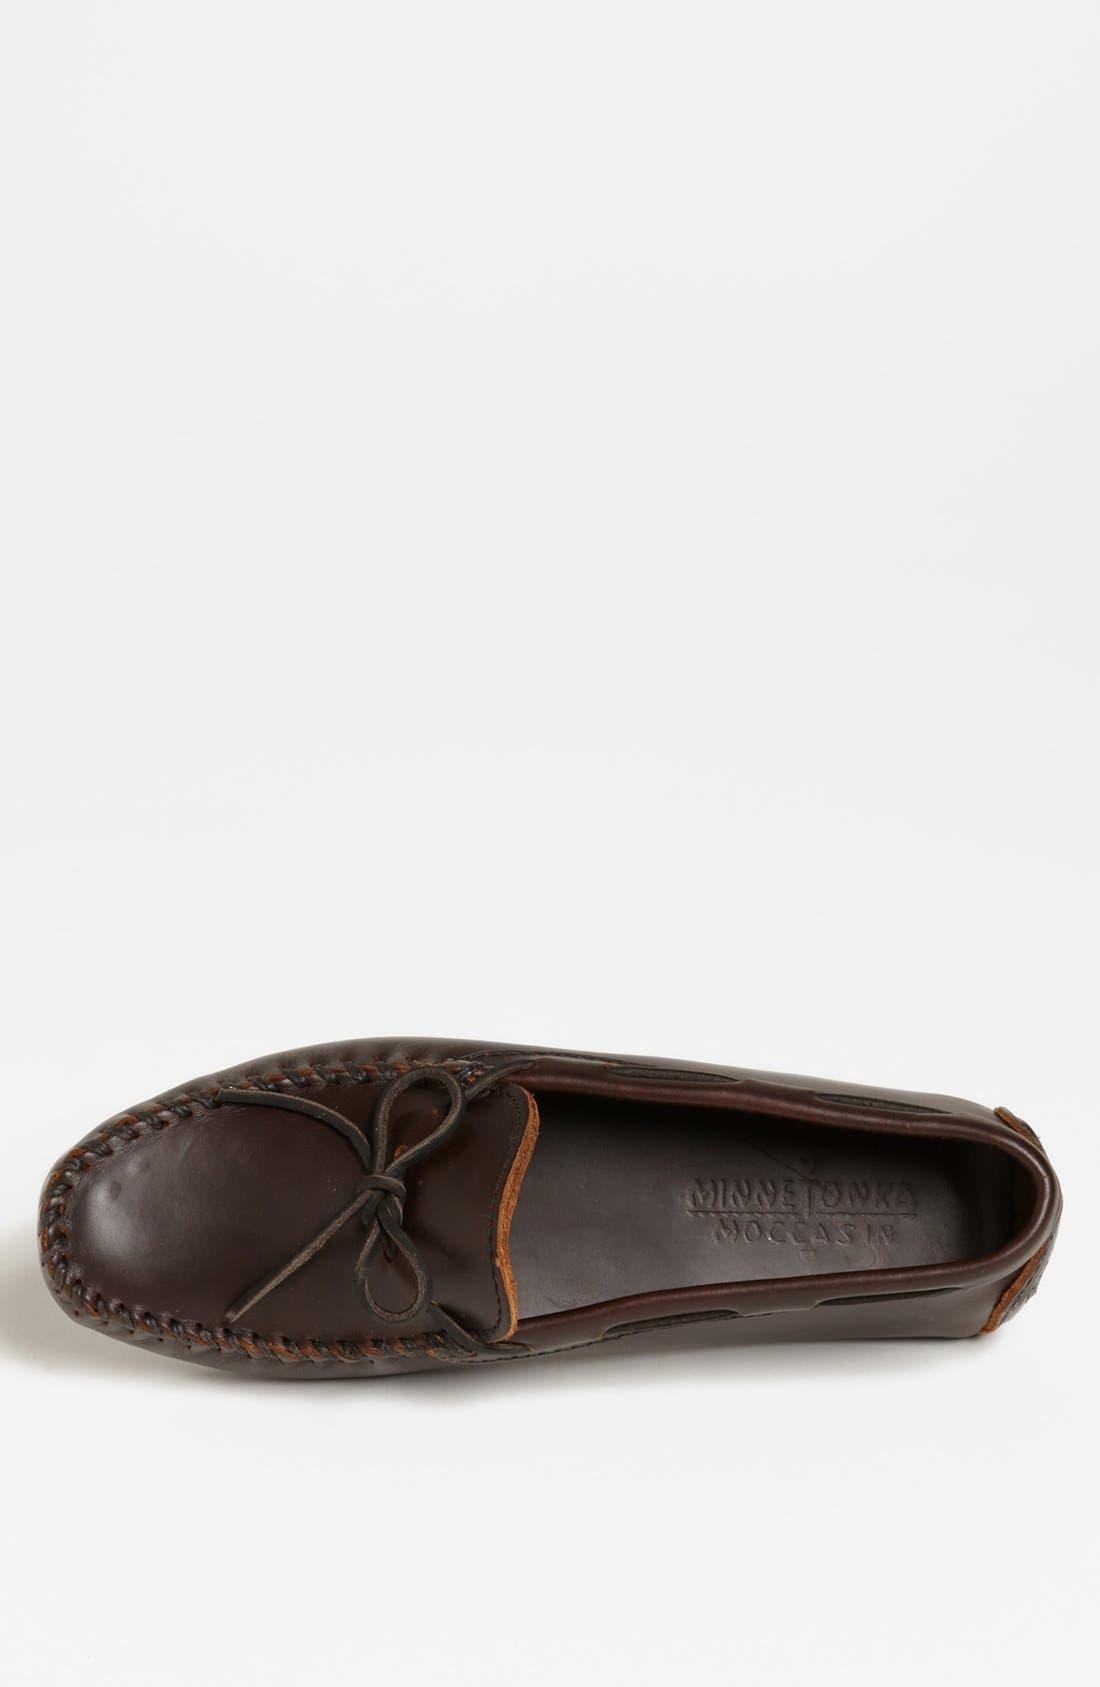 Alternate Image 3  - Minnetonka Leather Driving Shoe